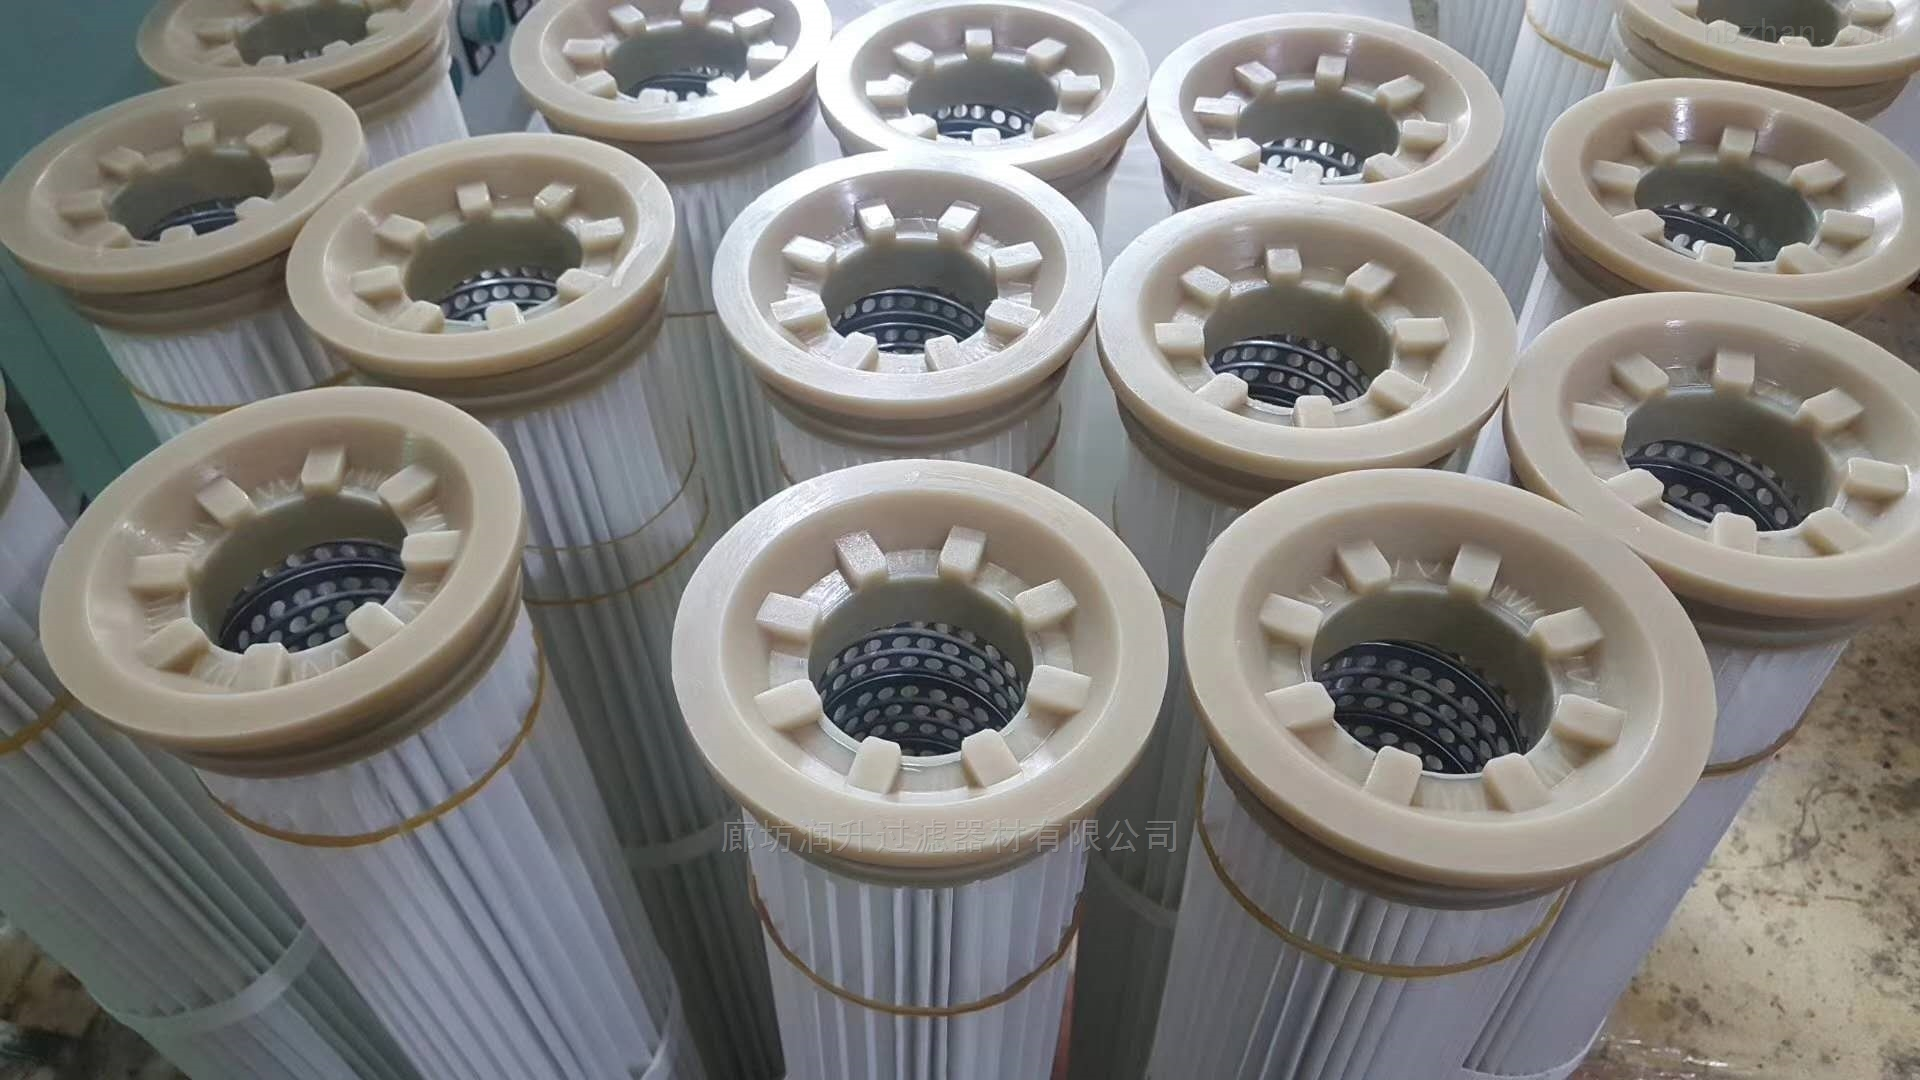 平谷DFM40PP005A01滤芯厂家价格